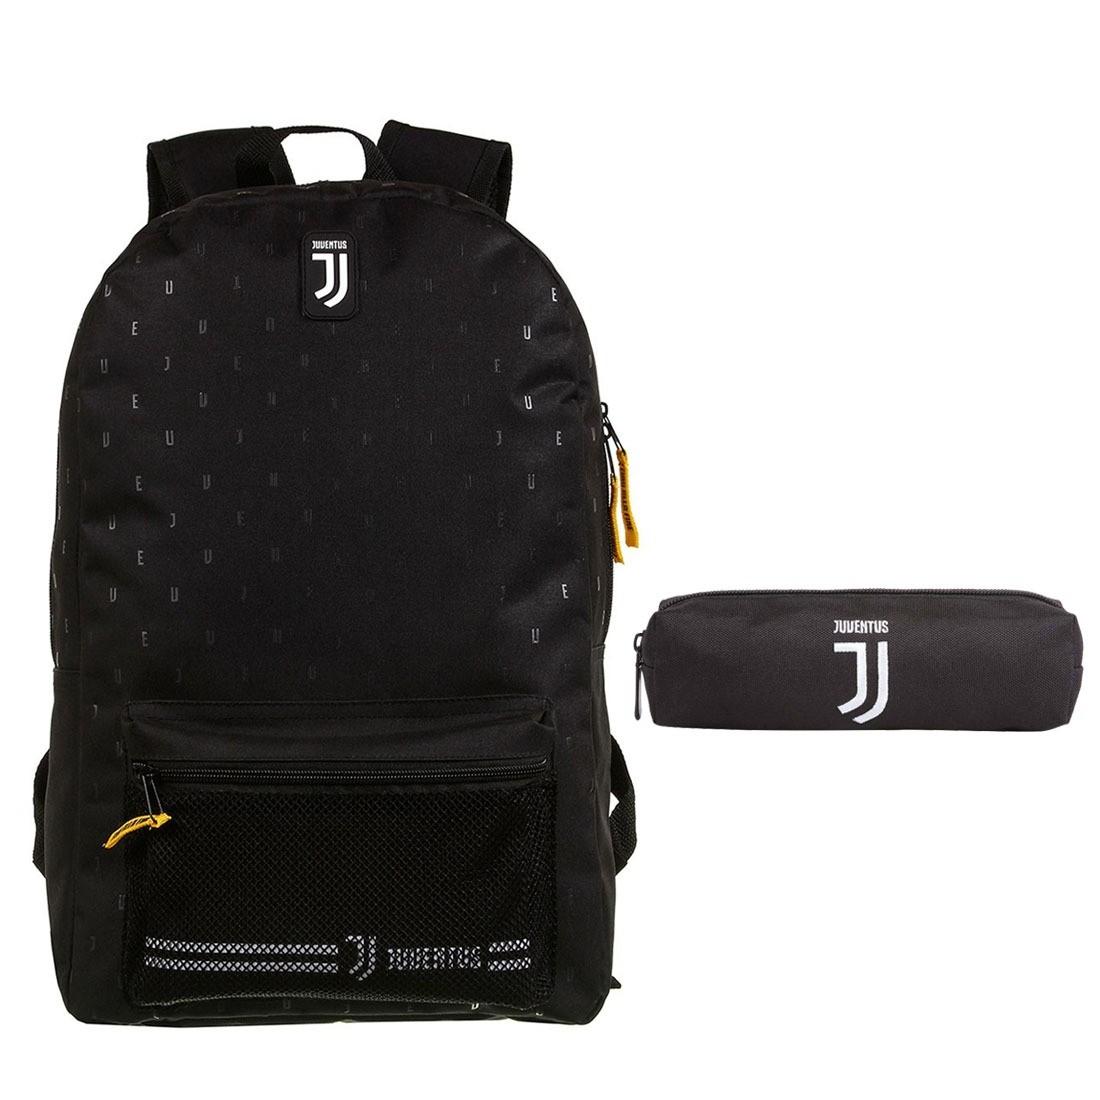 Mochila Escolar Juventus com Estojo